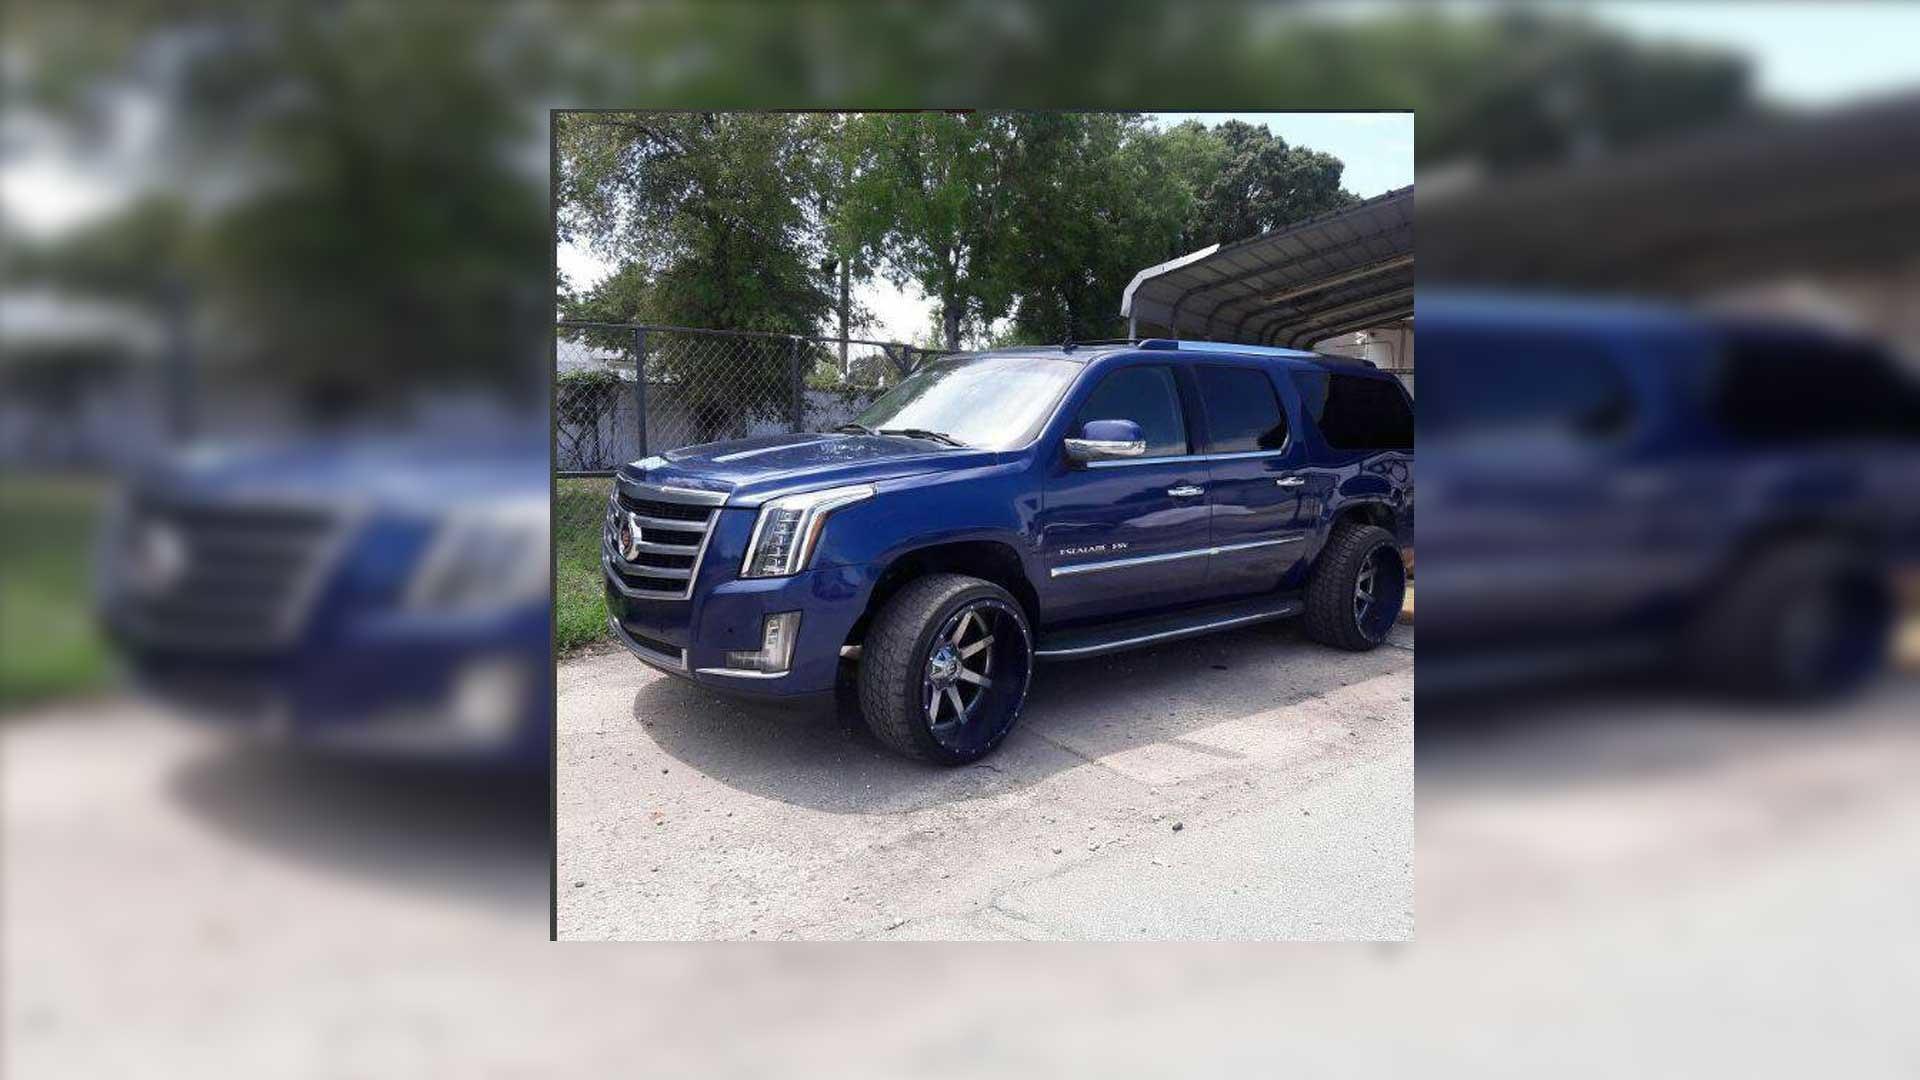 florida man grafts 2017 front end on 2007 cadillac escalade2006 Cadillac Escalade Esv Custom #21